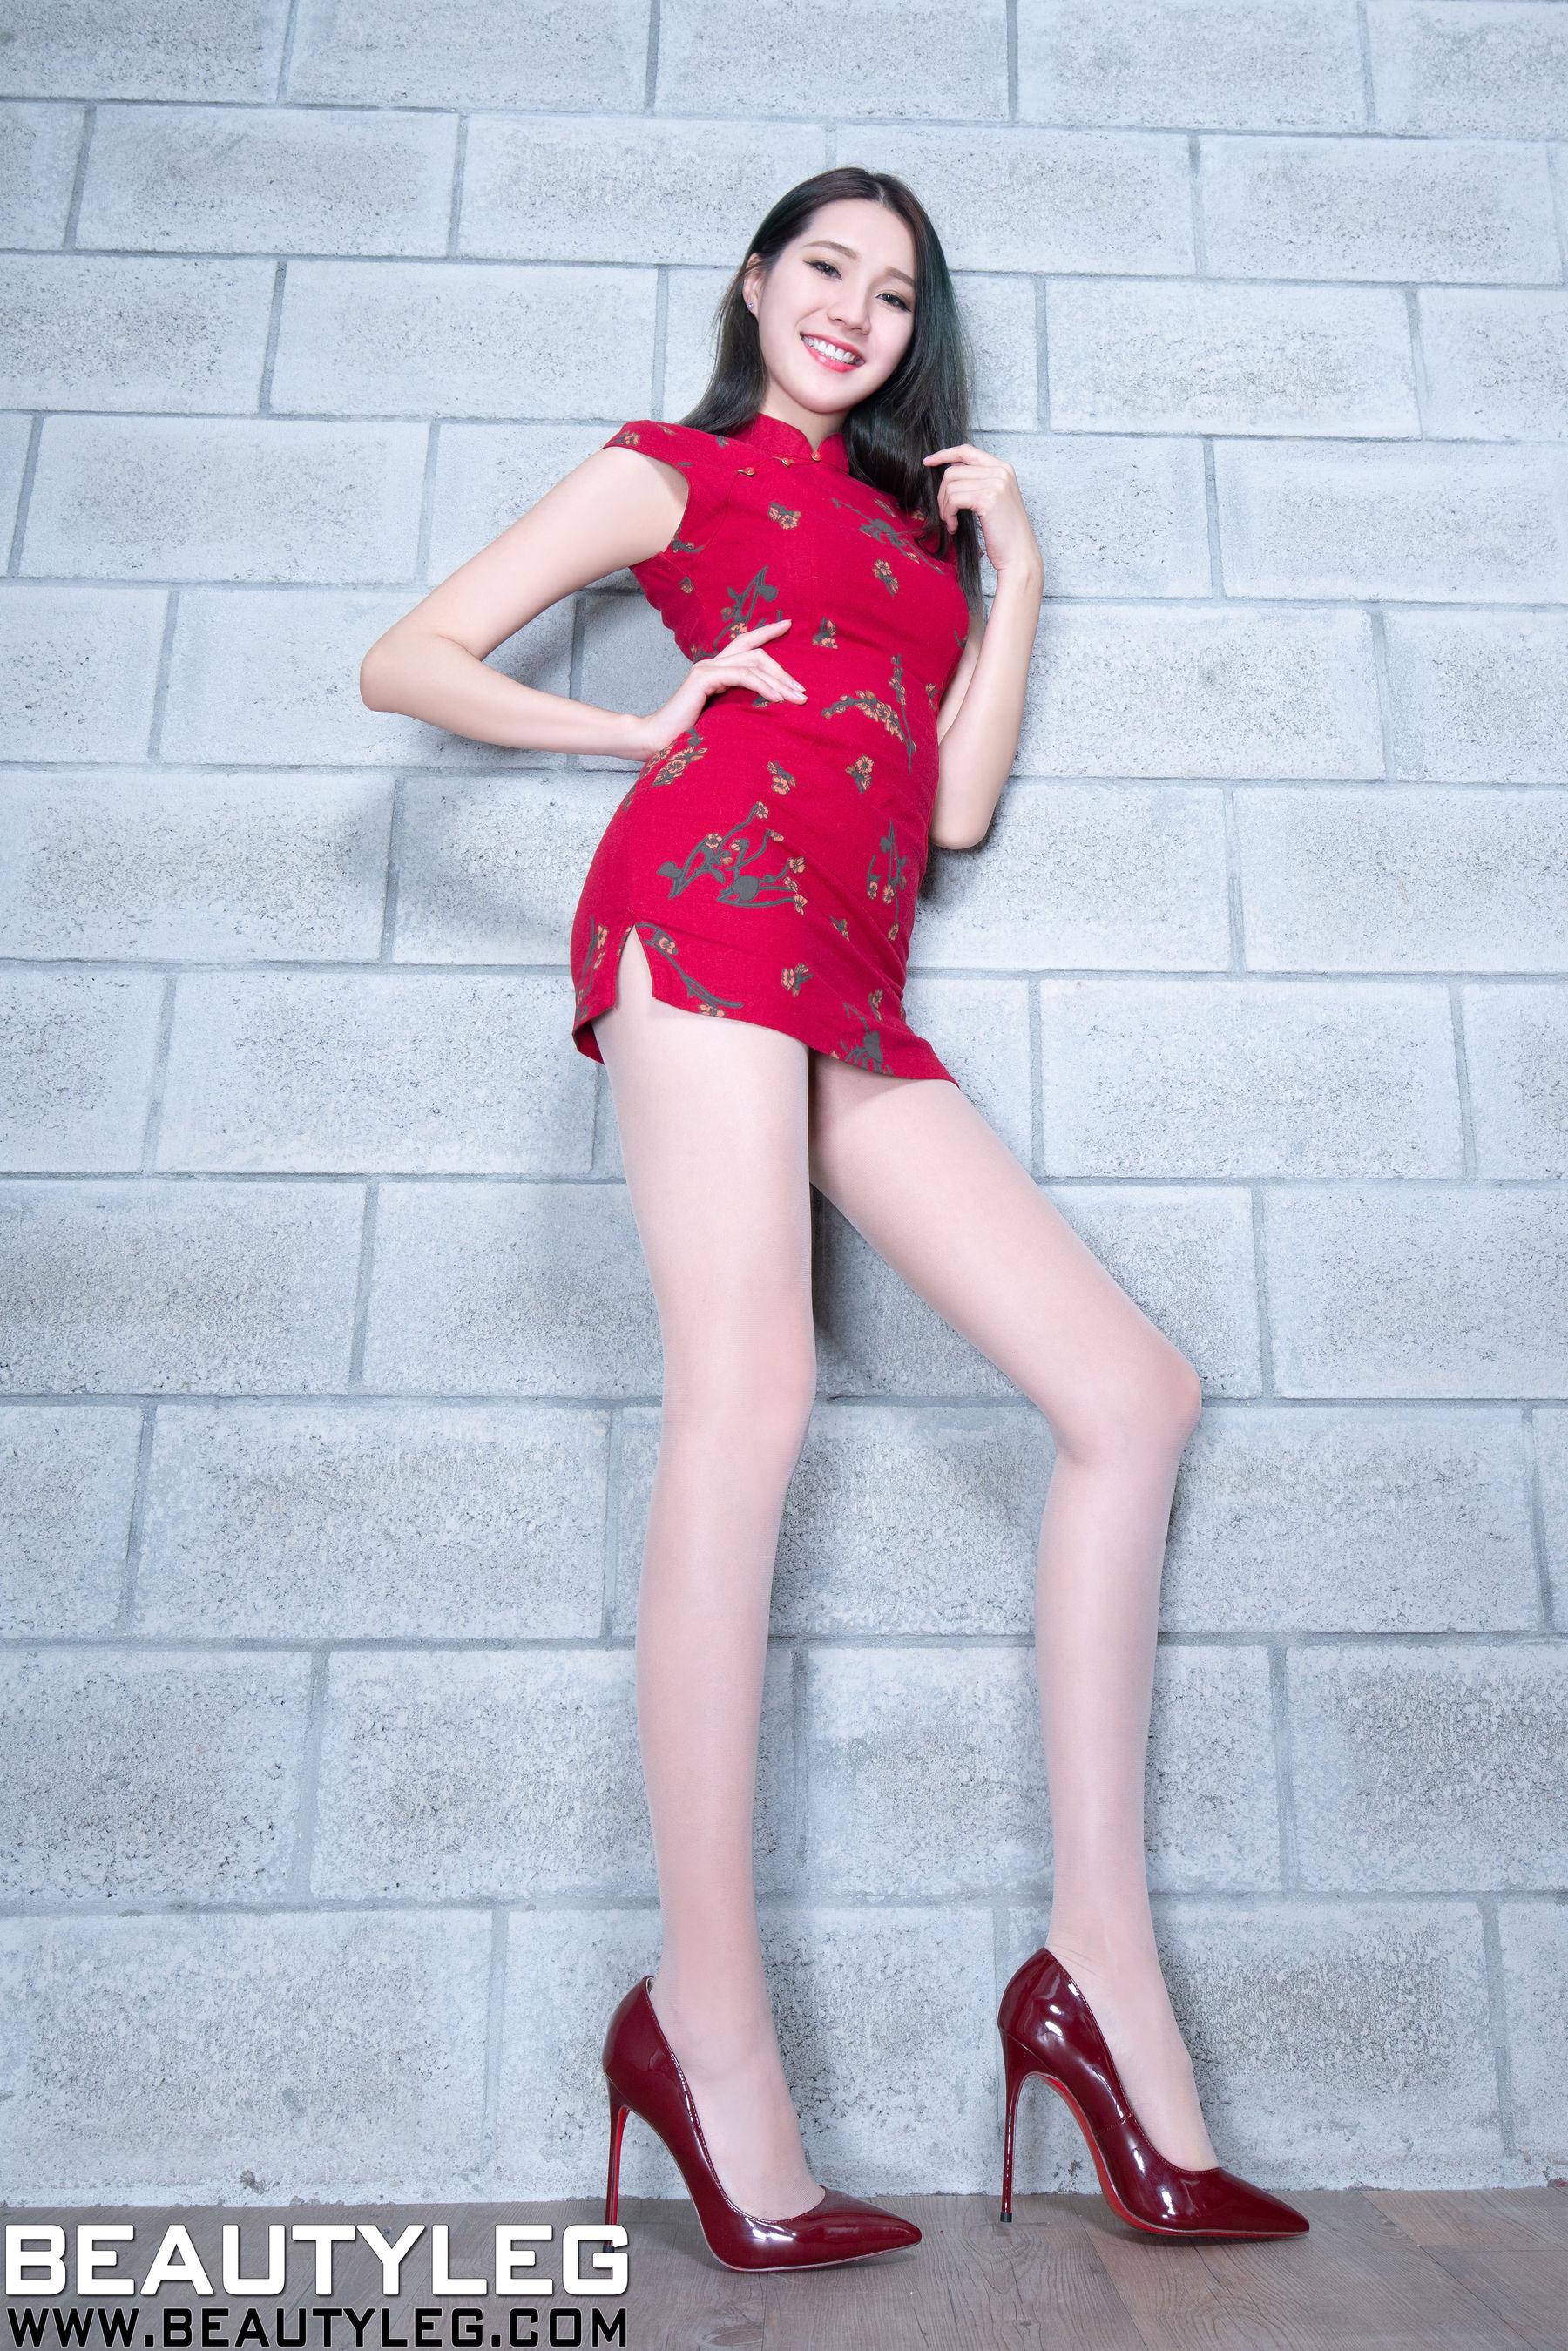 VOL.1431 [Beautyleg]美腿旗袍高跟:林千如(腿模Anita)超高清个人性感漂亮大图(52P)